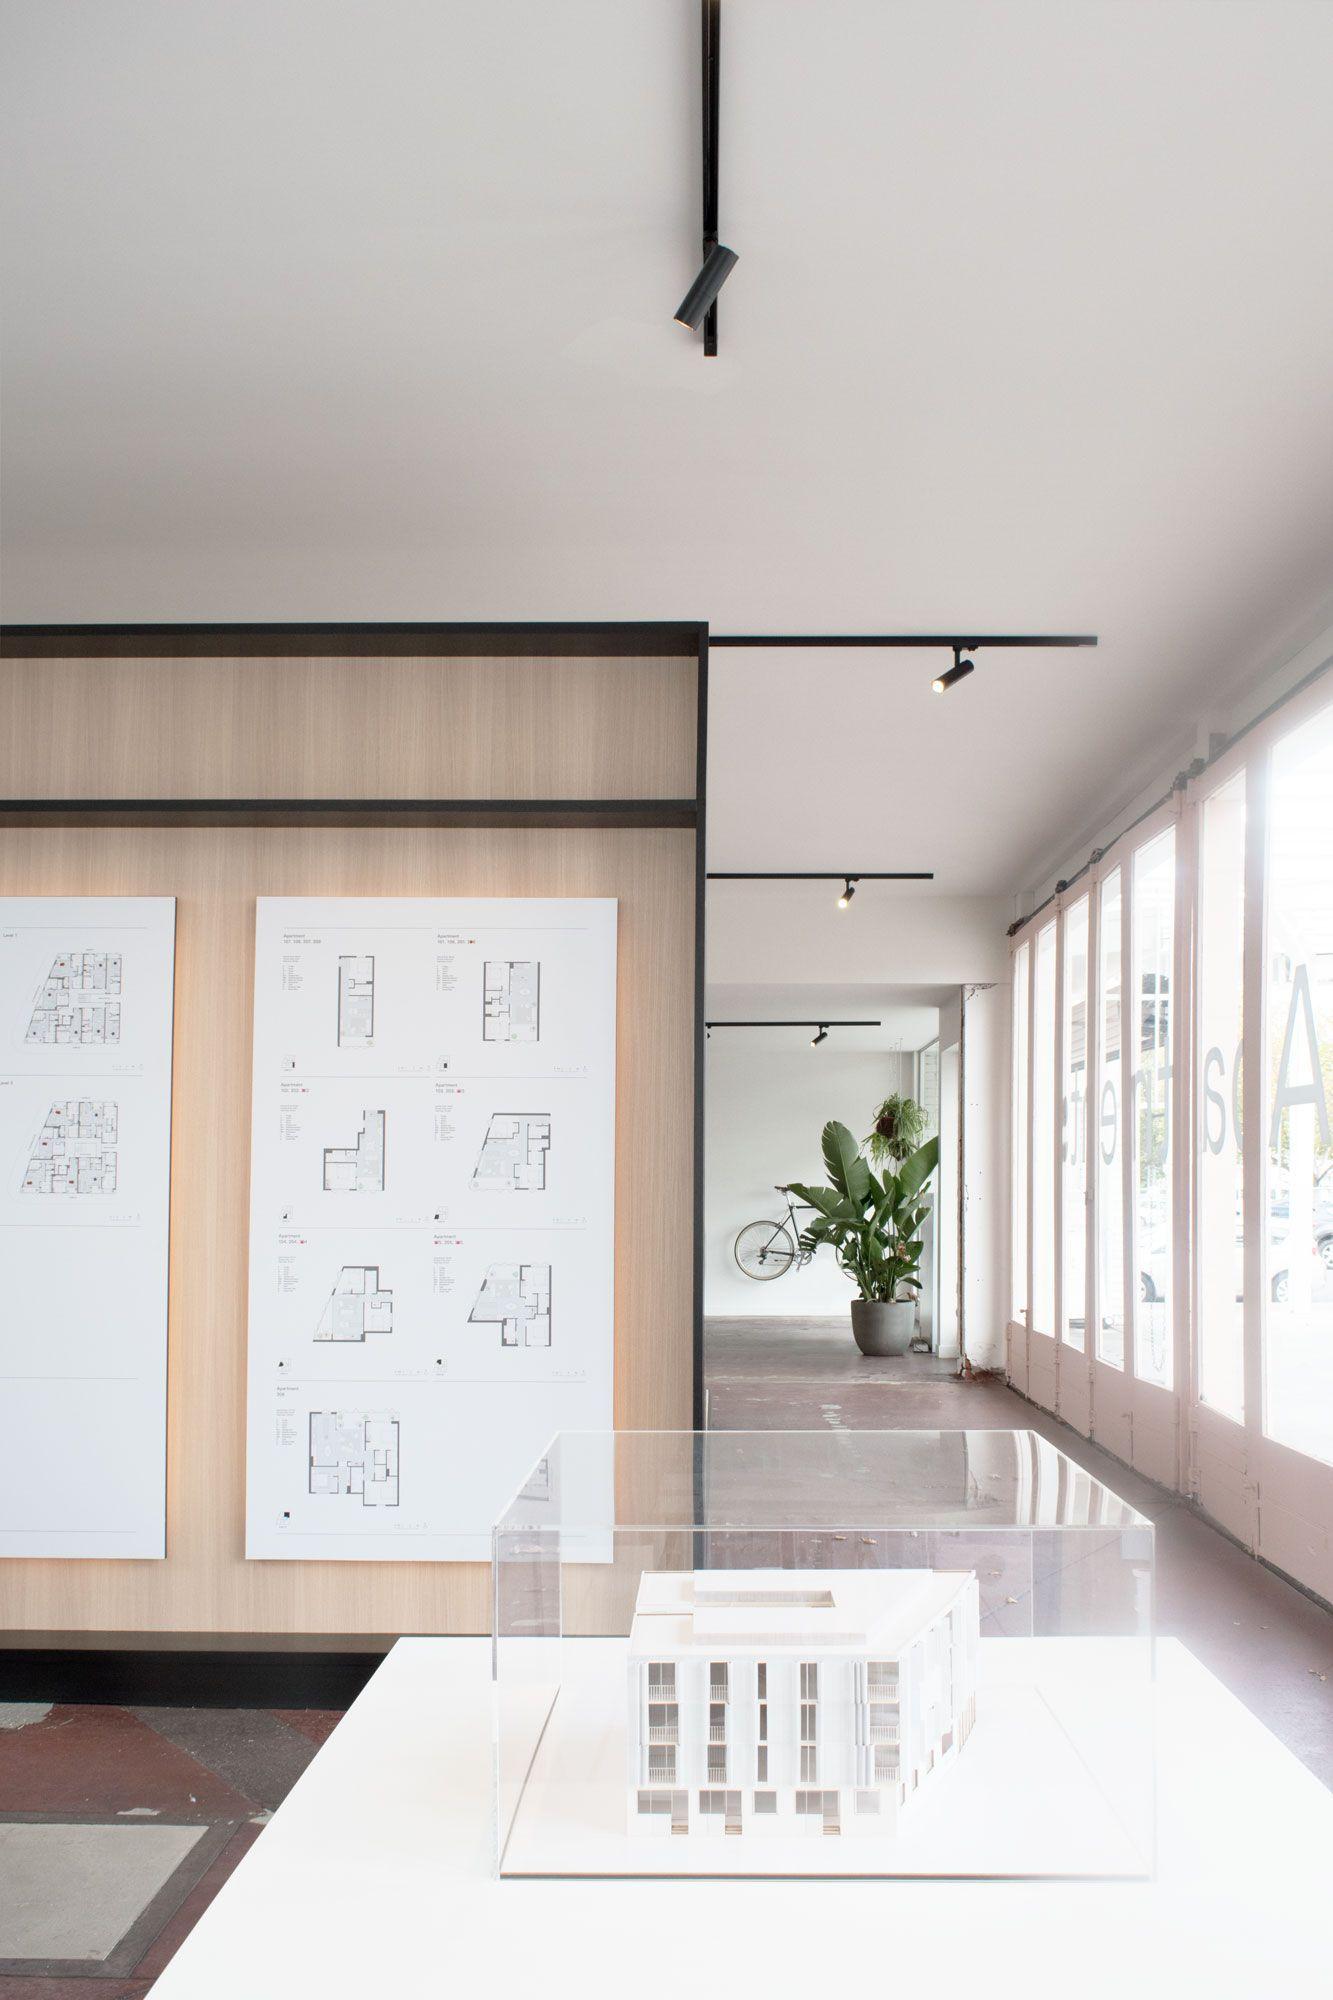 Office Interior Design Services Industrial Office Interior Design Medical Office Interior Design E In 2020 Apartment Display Office Interior Design Showroom Design